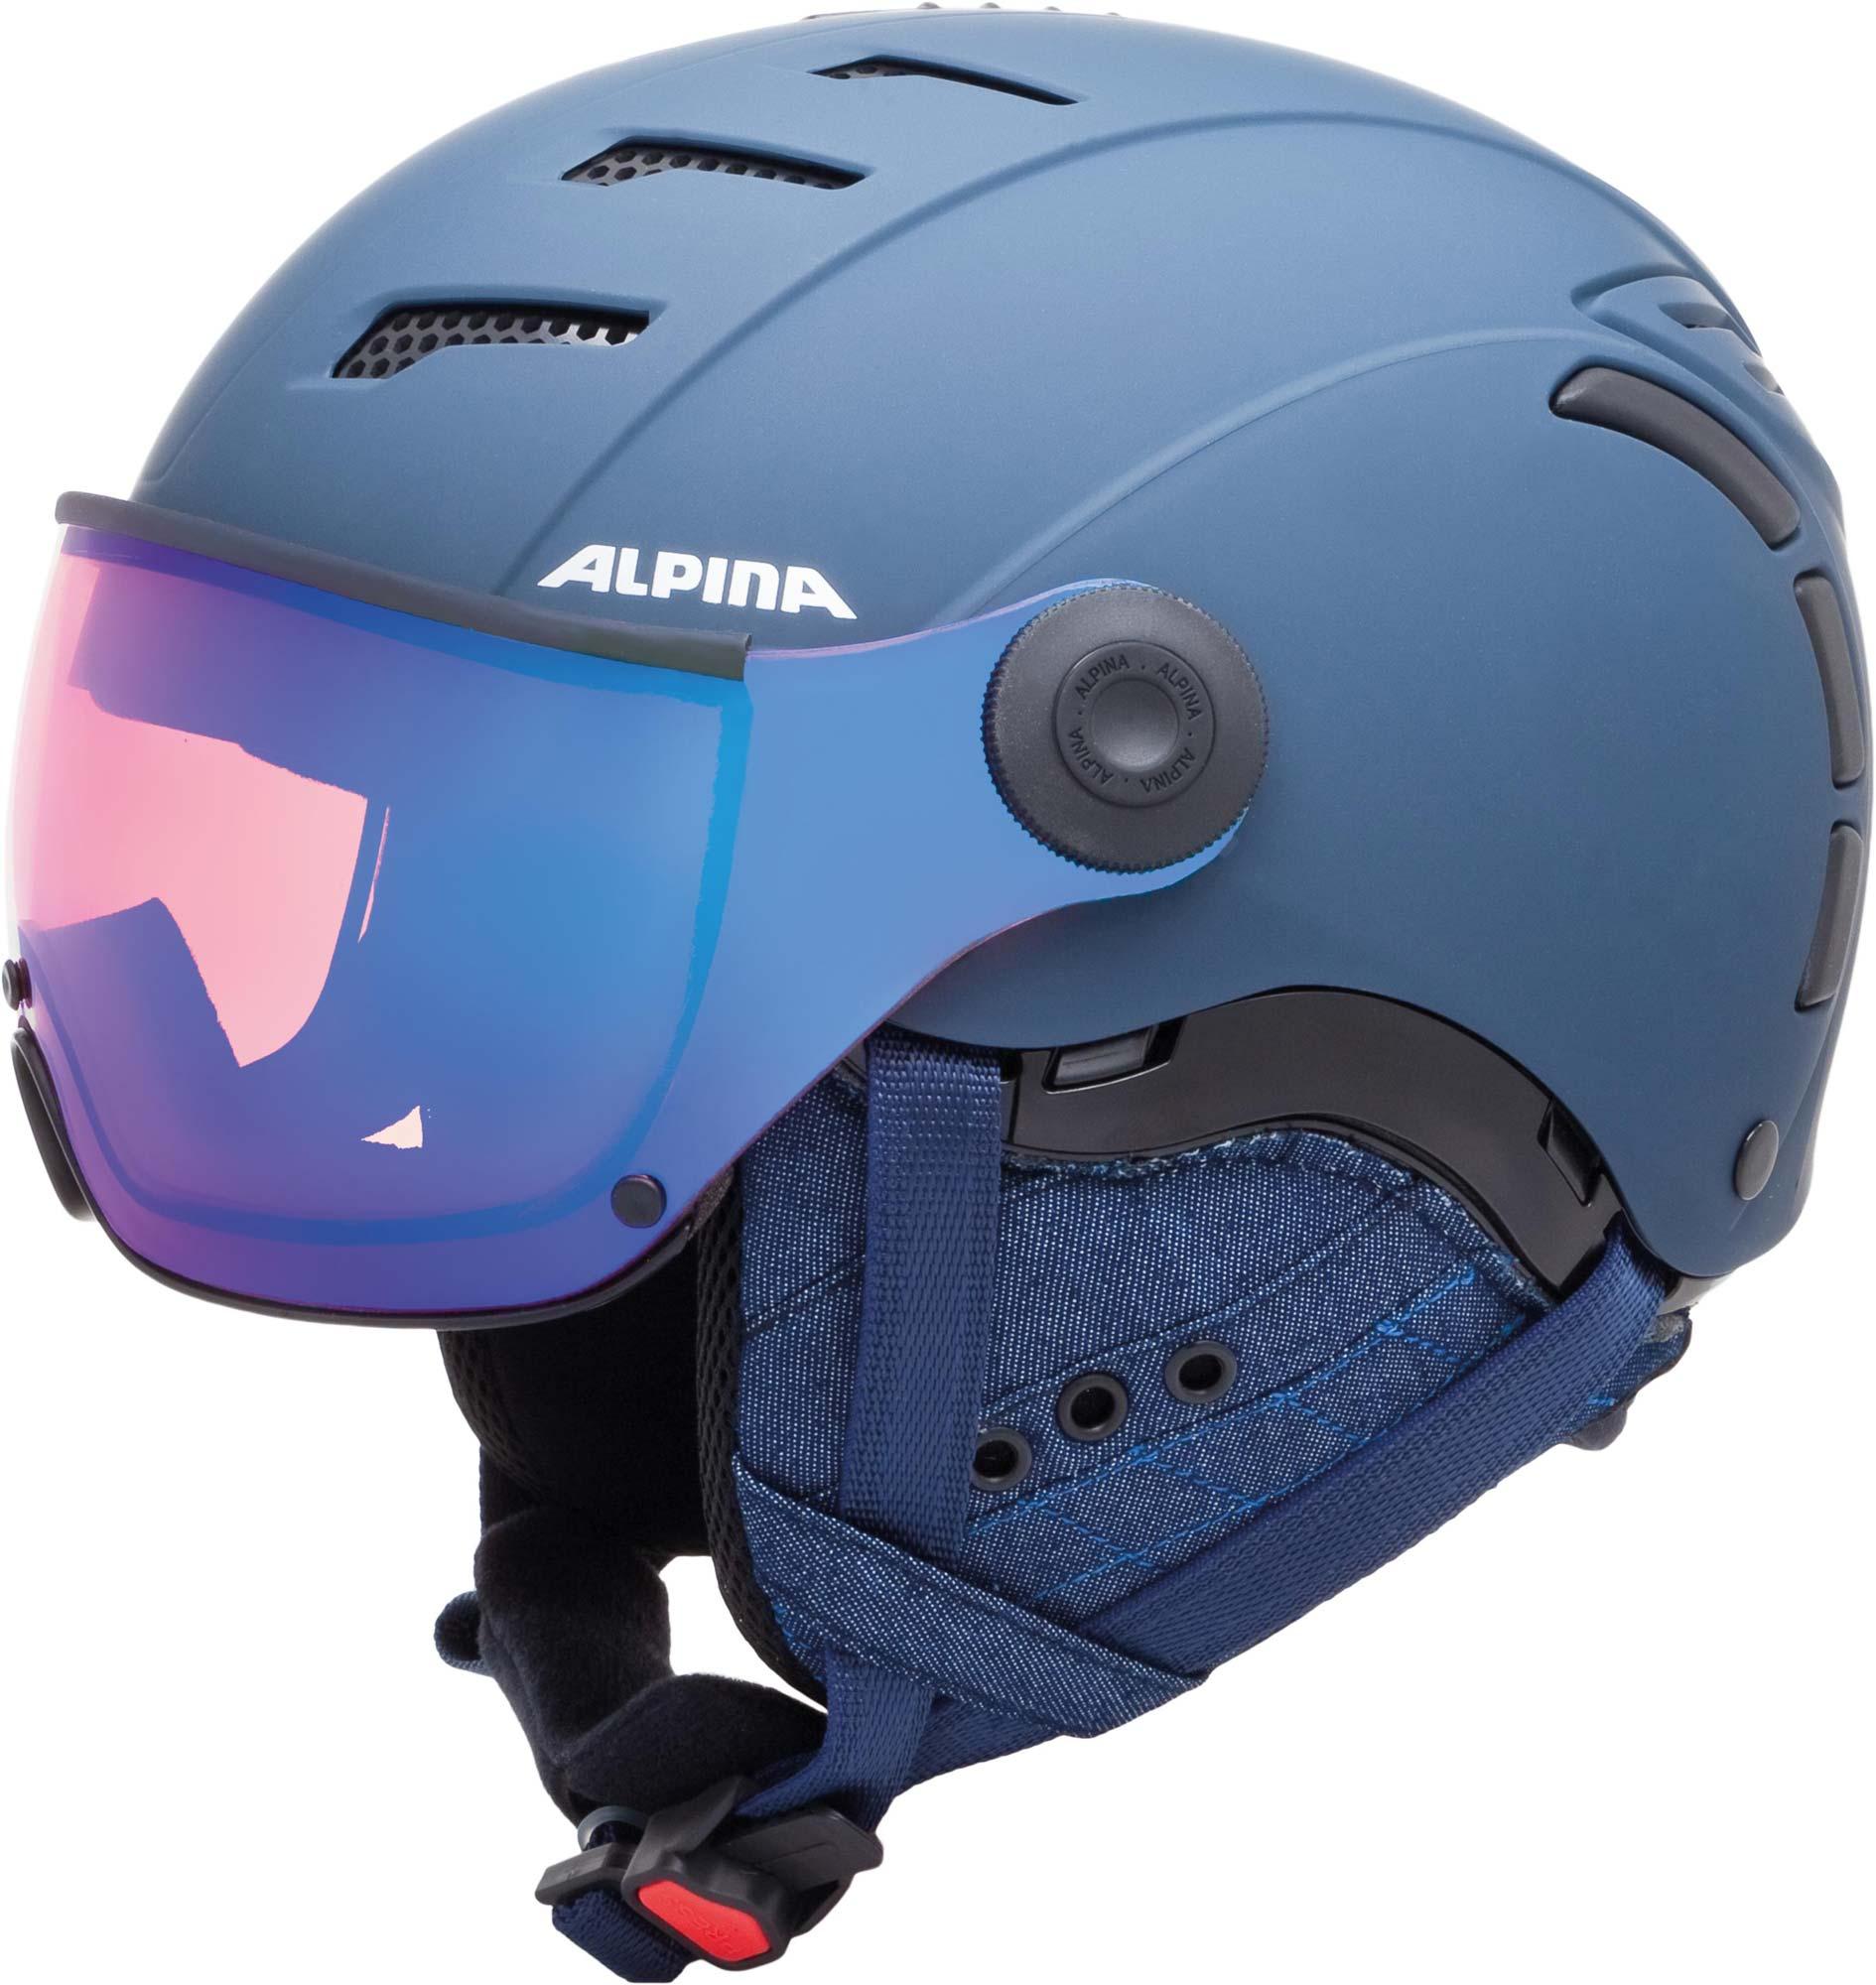 Alpina Jump 2.0 QVMM - Skihelm mit Visier - nightblue denim matt - Gr. 59-61